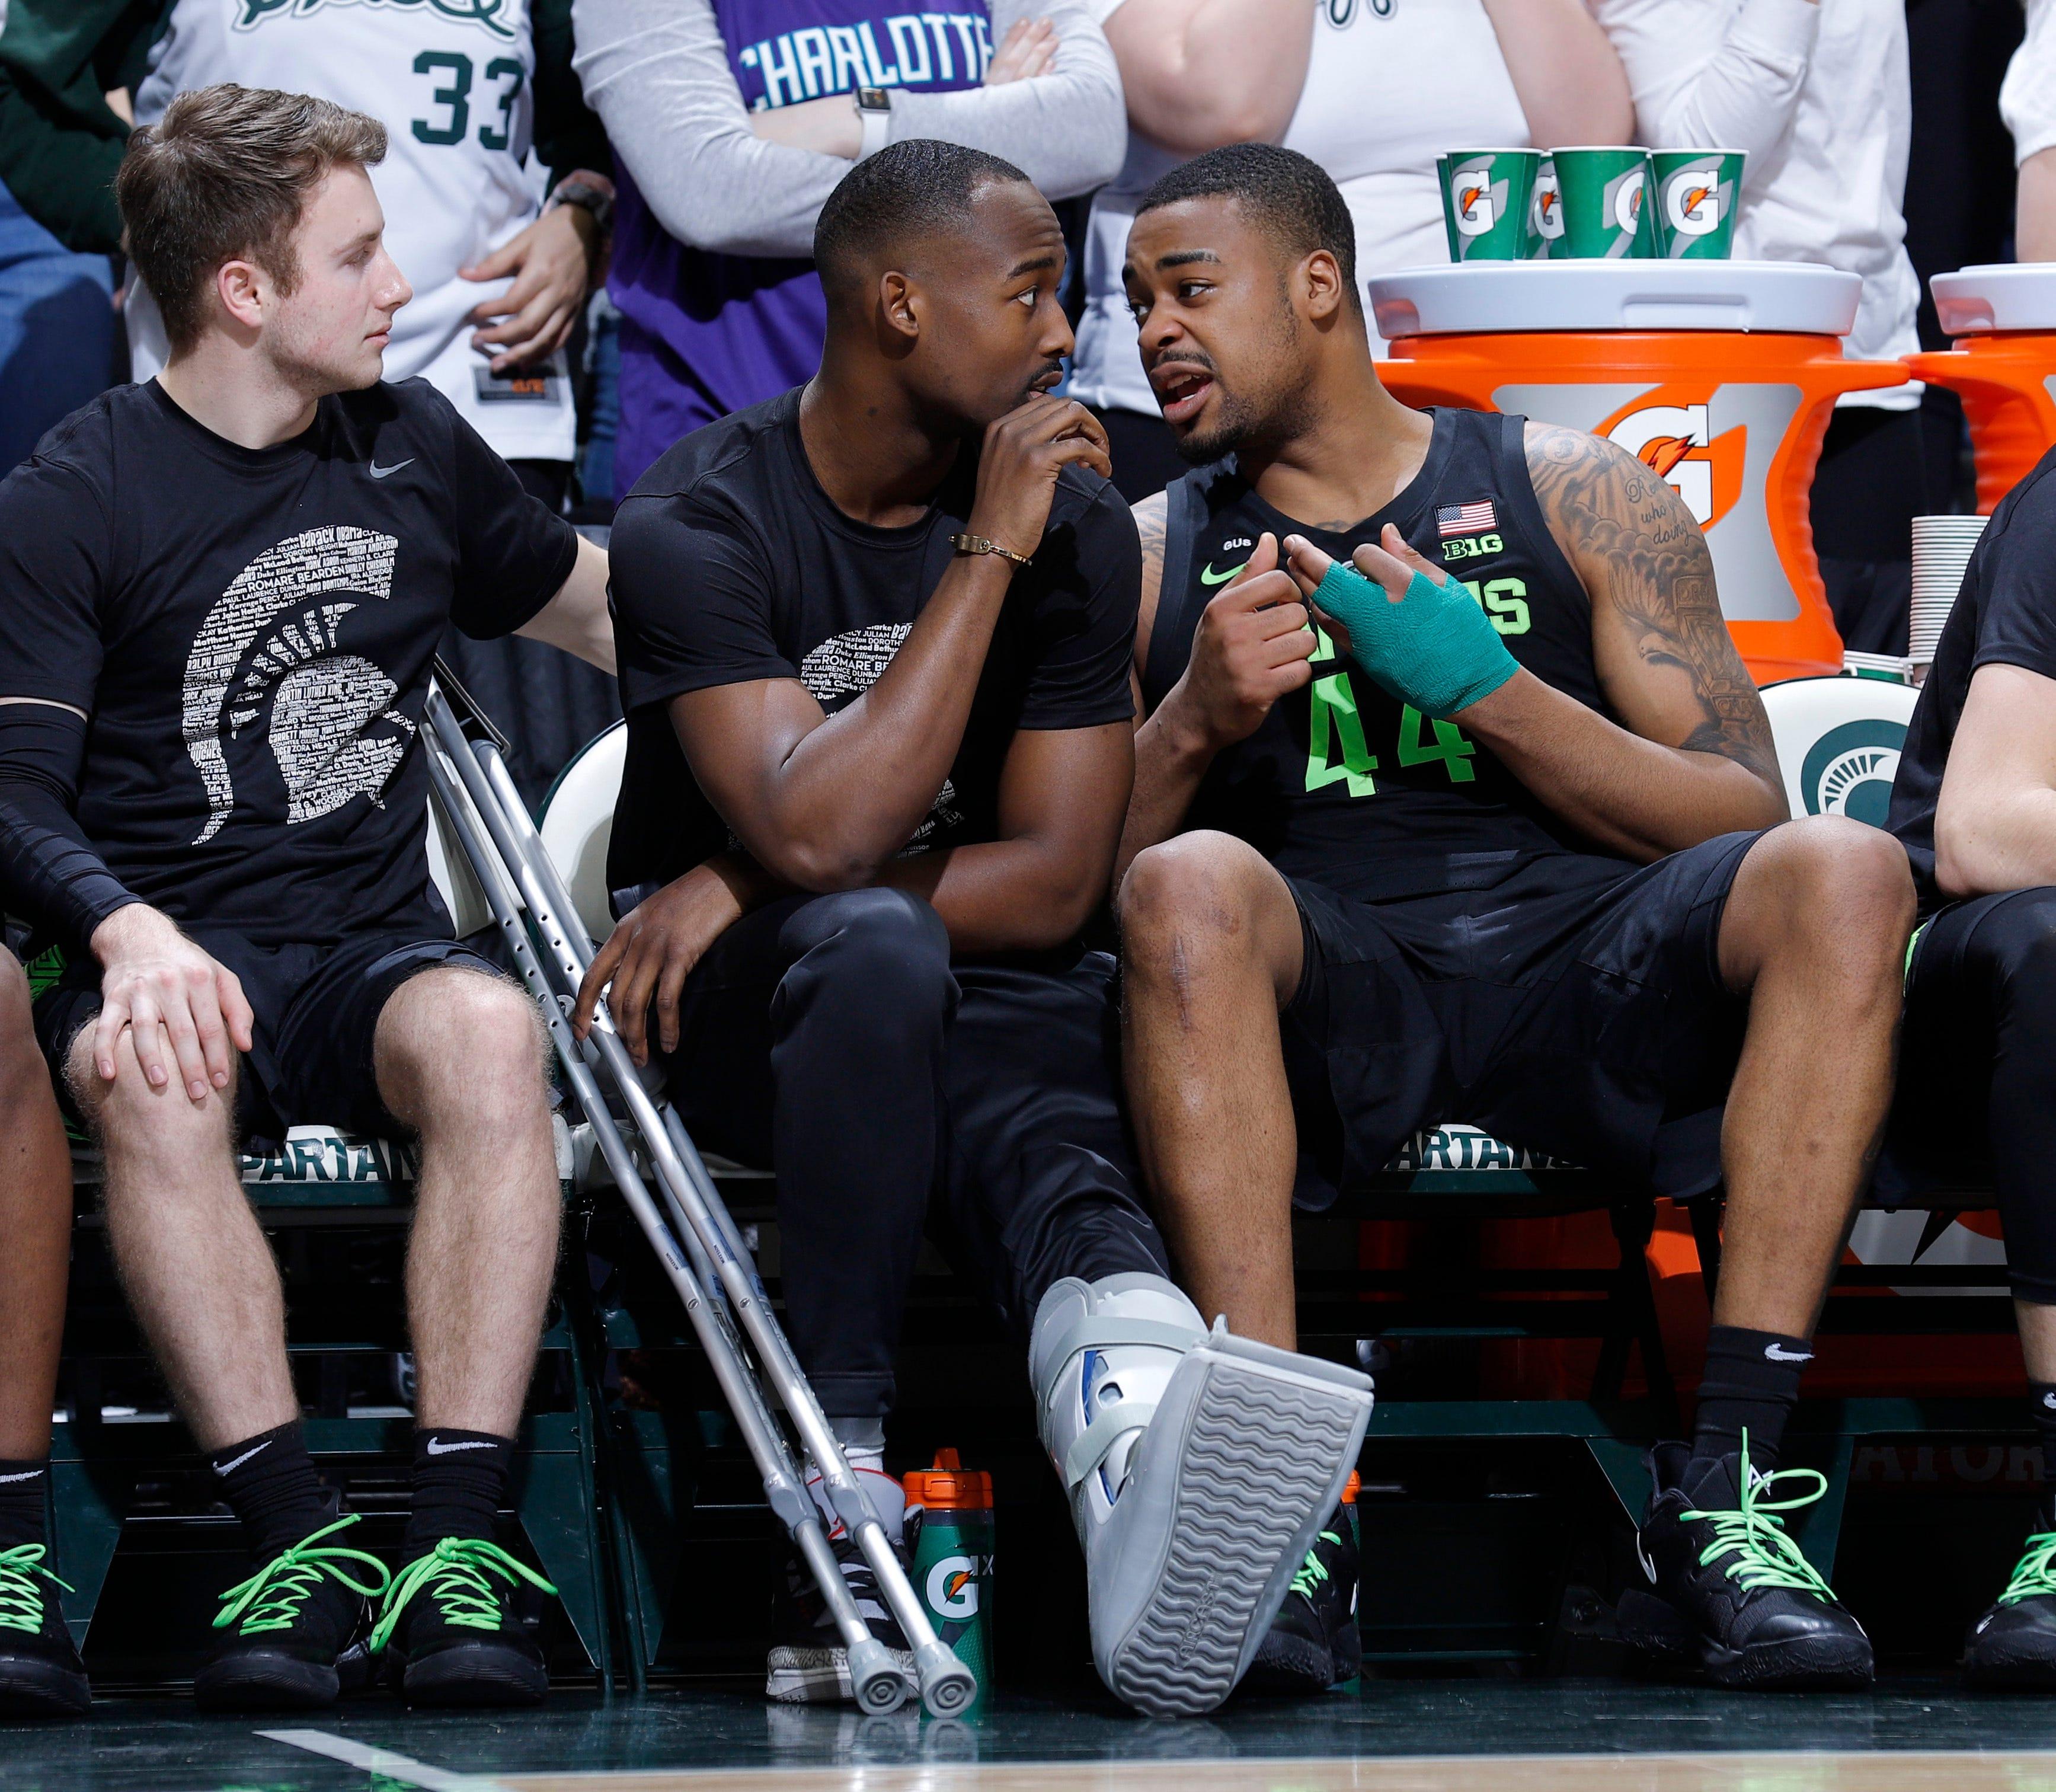 Braden Burke Michigan State Spartans Final Four Basketball Jersey - Green